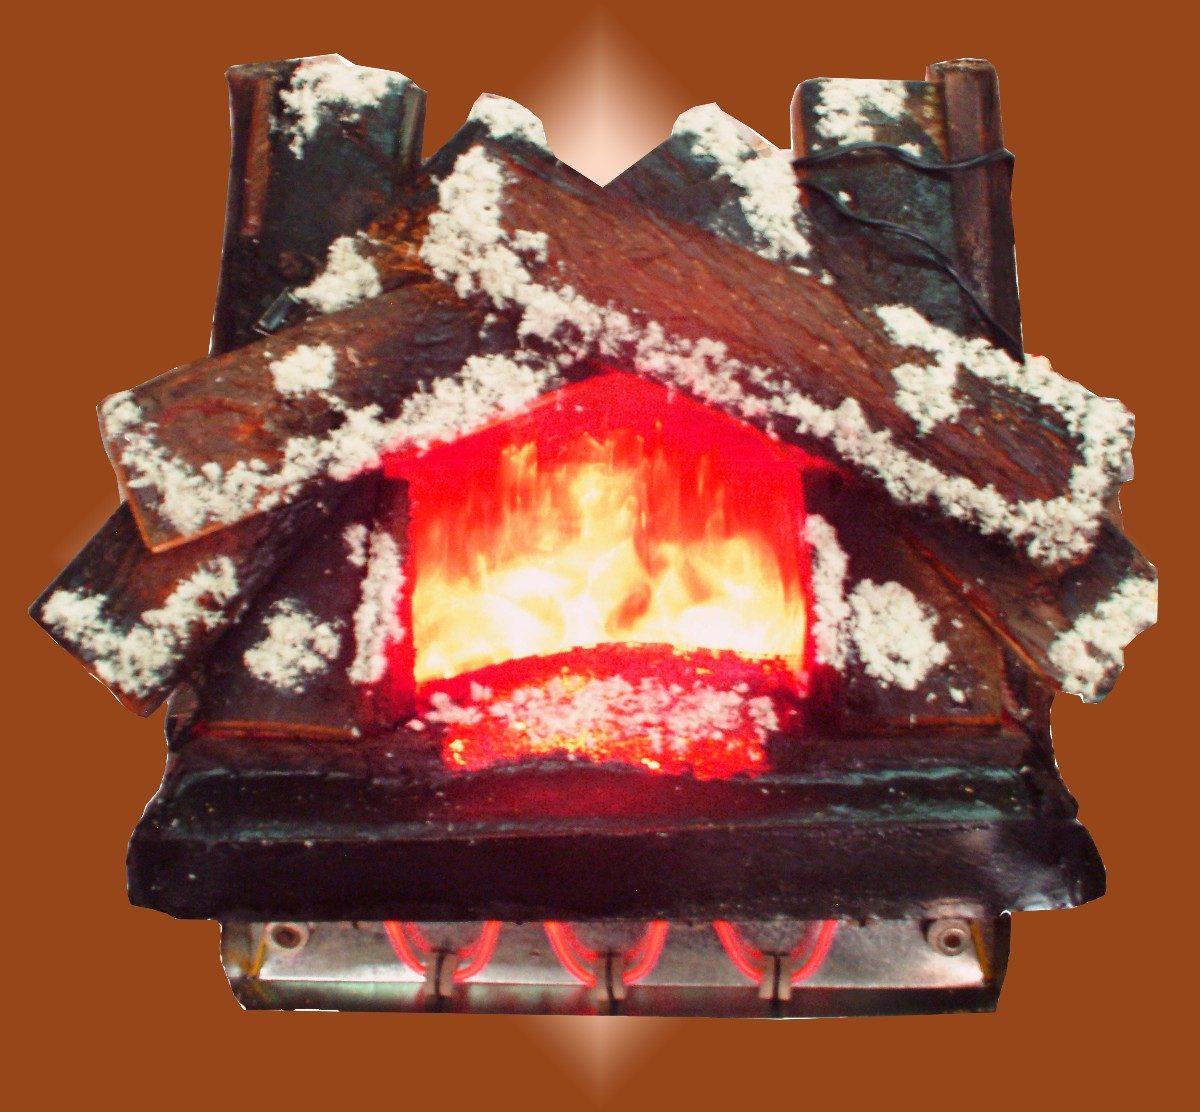 Chimenea fogata para chimenea el ctrica con calefacci n for Chimeneas electricas baratas